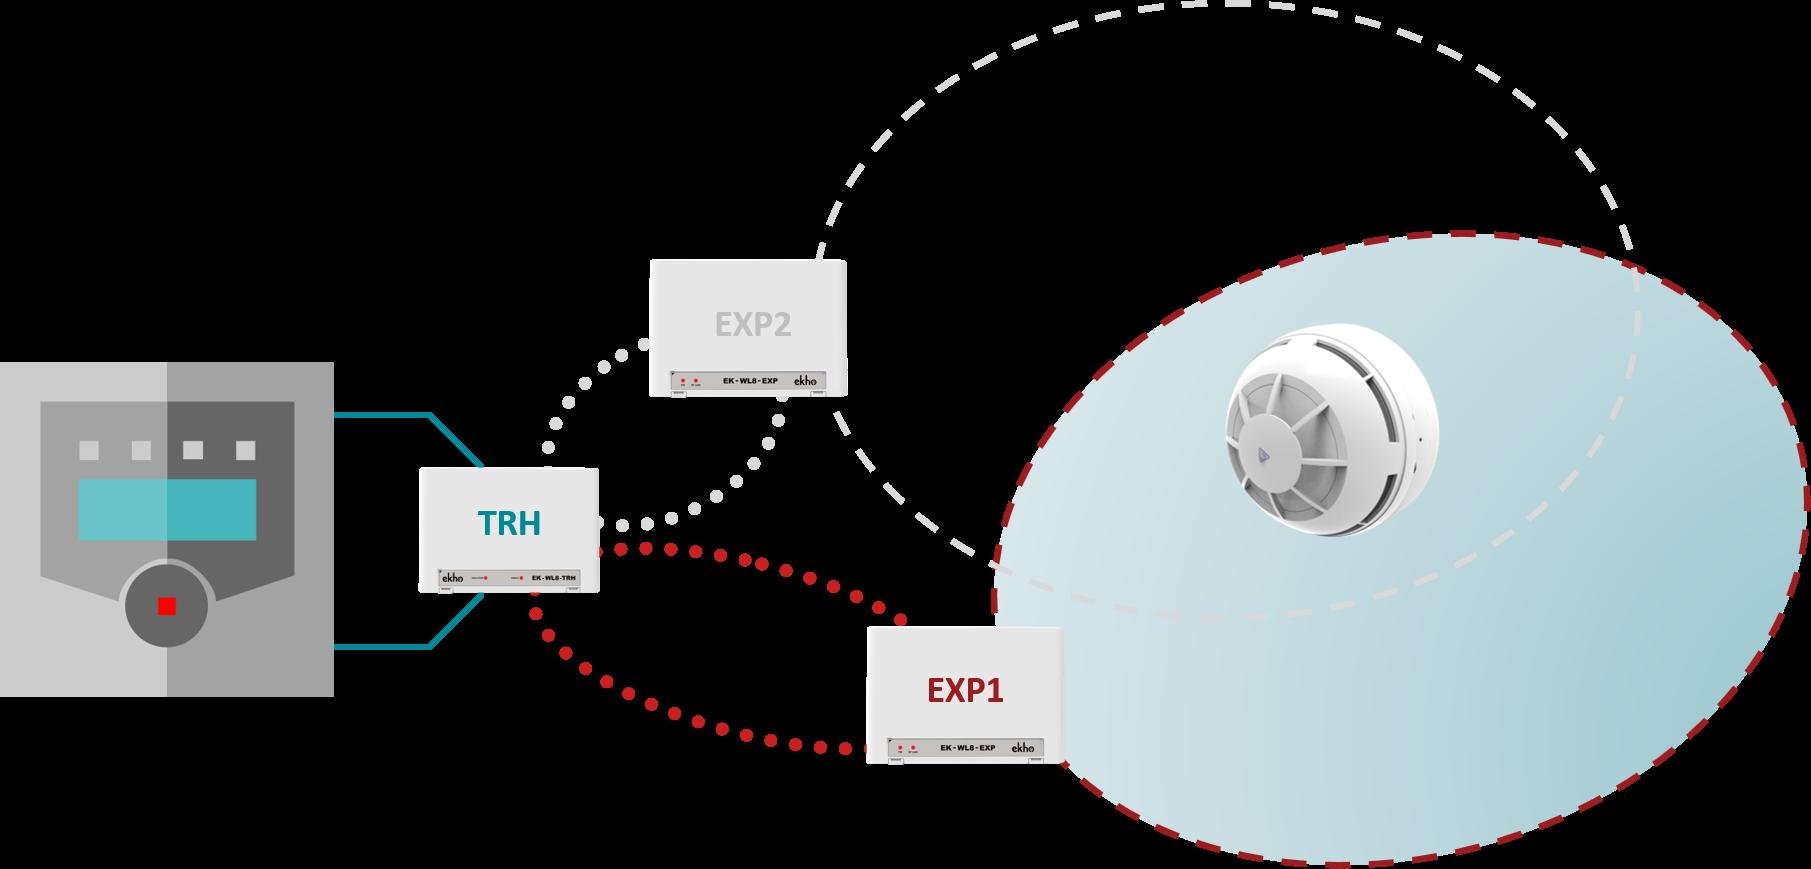 Expander Network 1